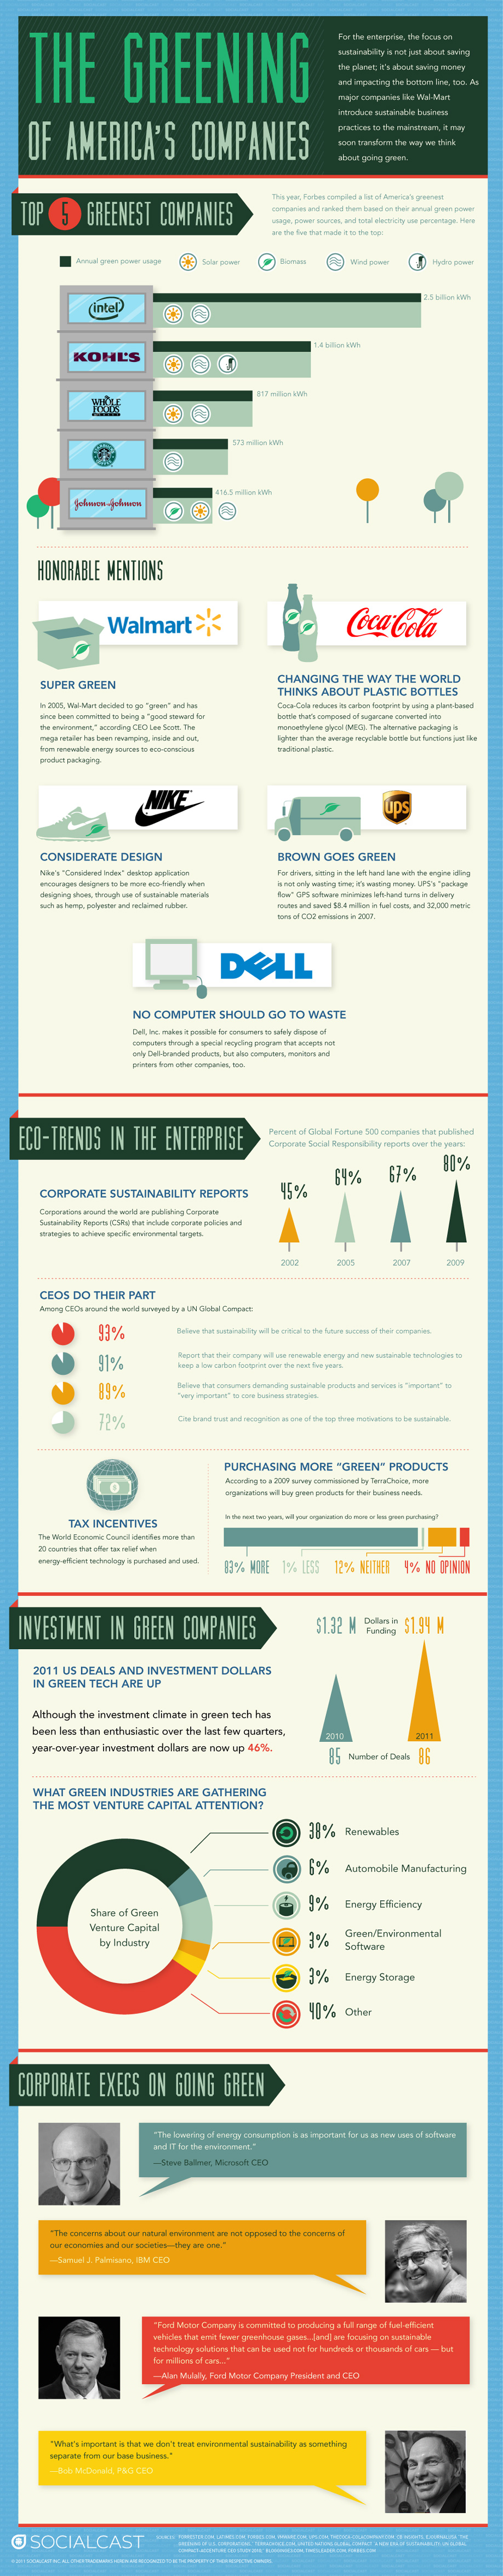 The Greening Of America's Companies